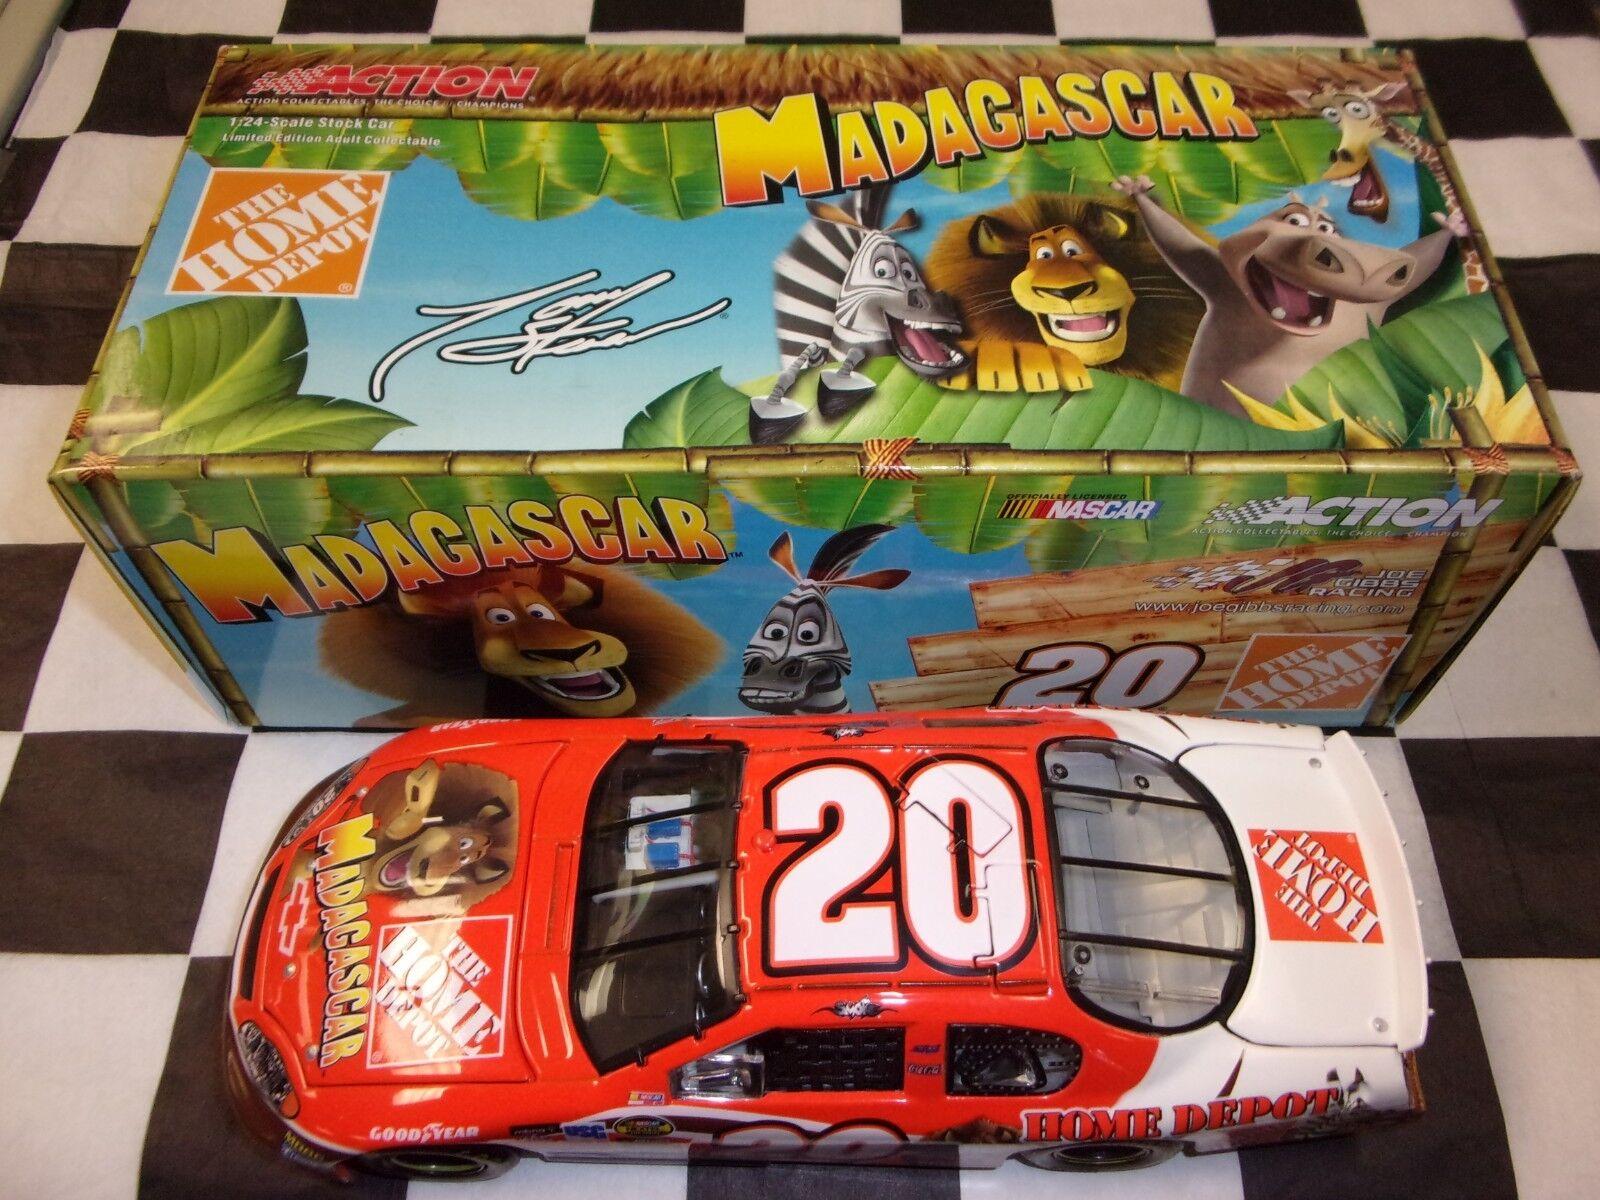 Tony Stewart  20 Home Depot Madagascar 2005 Monte Carlo NASCAR Action 1 24 scale